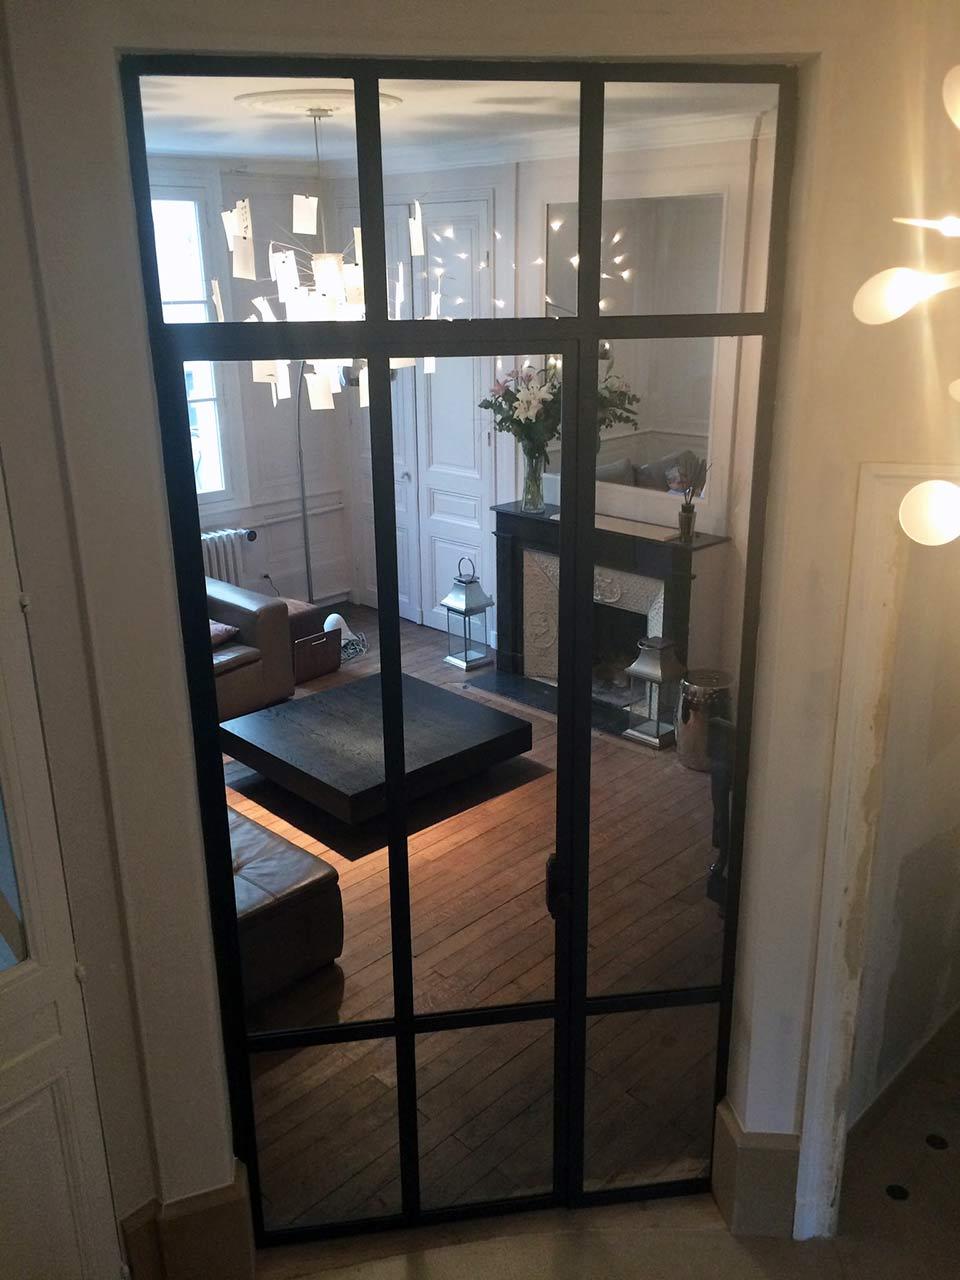 Verri res d atelier d artiste munch et foucher portes for Cloison atelier artiste